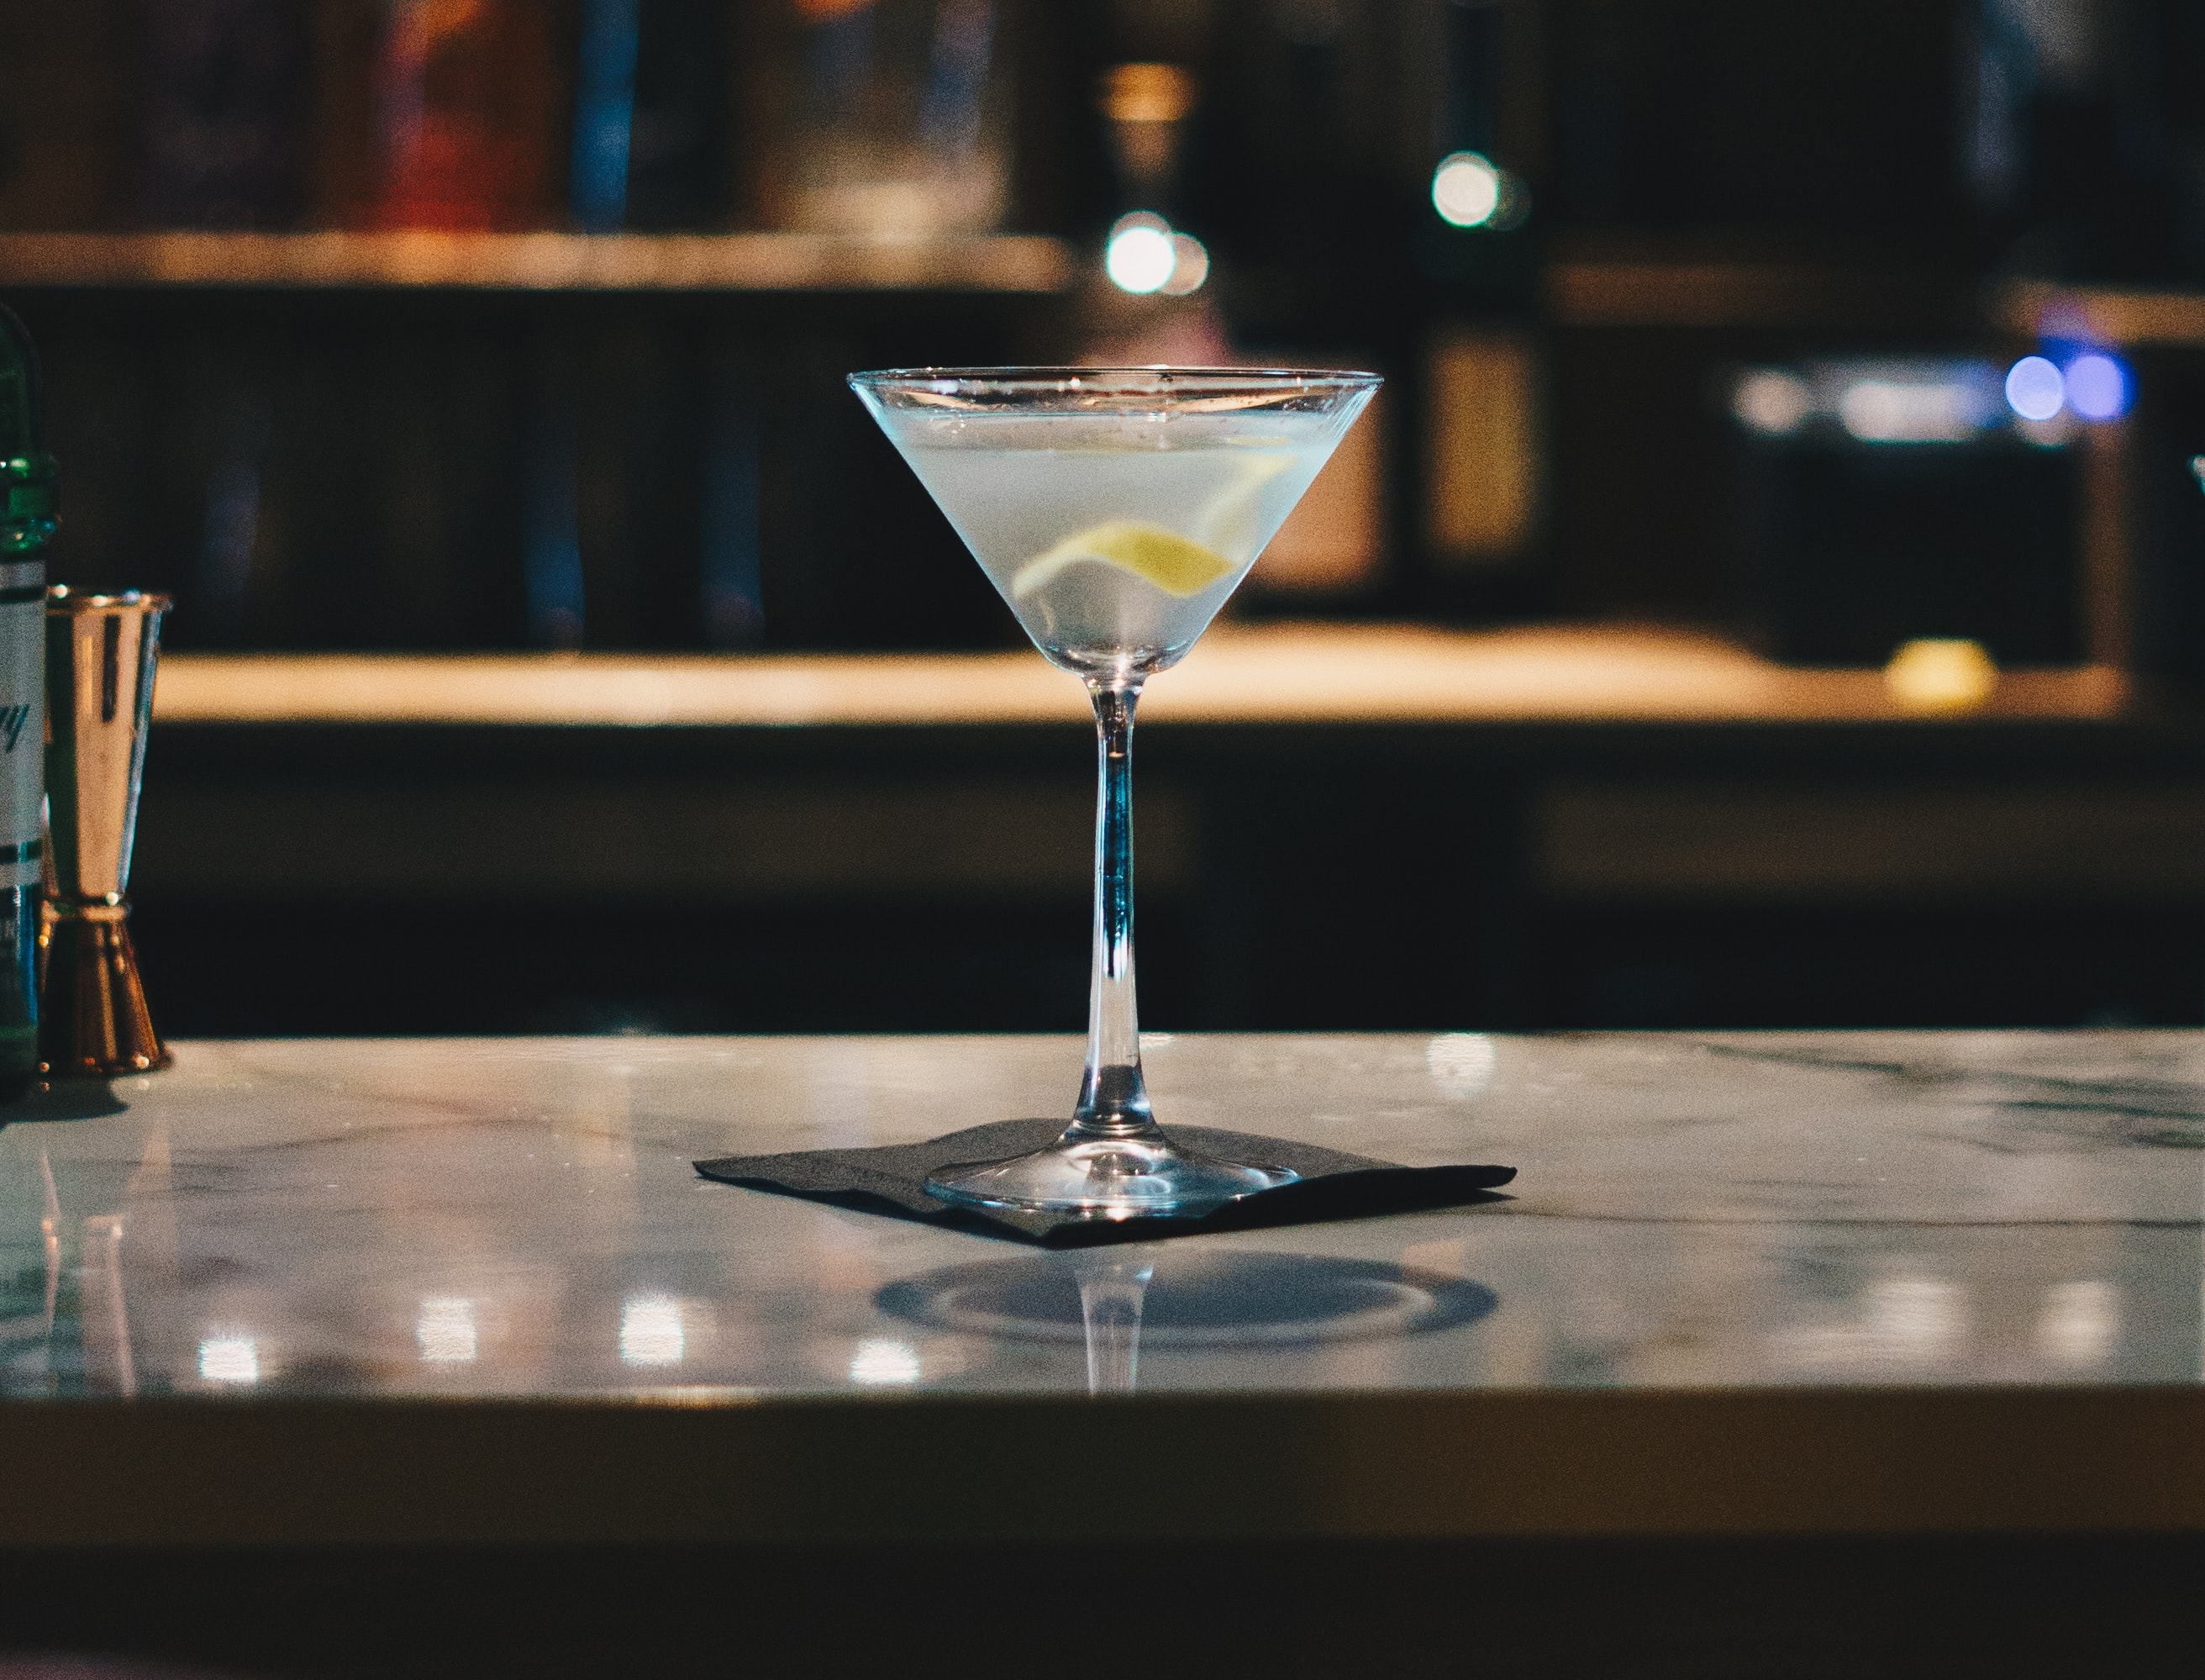 A martini on a bar